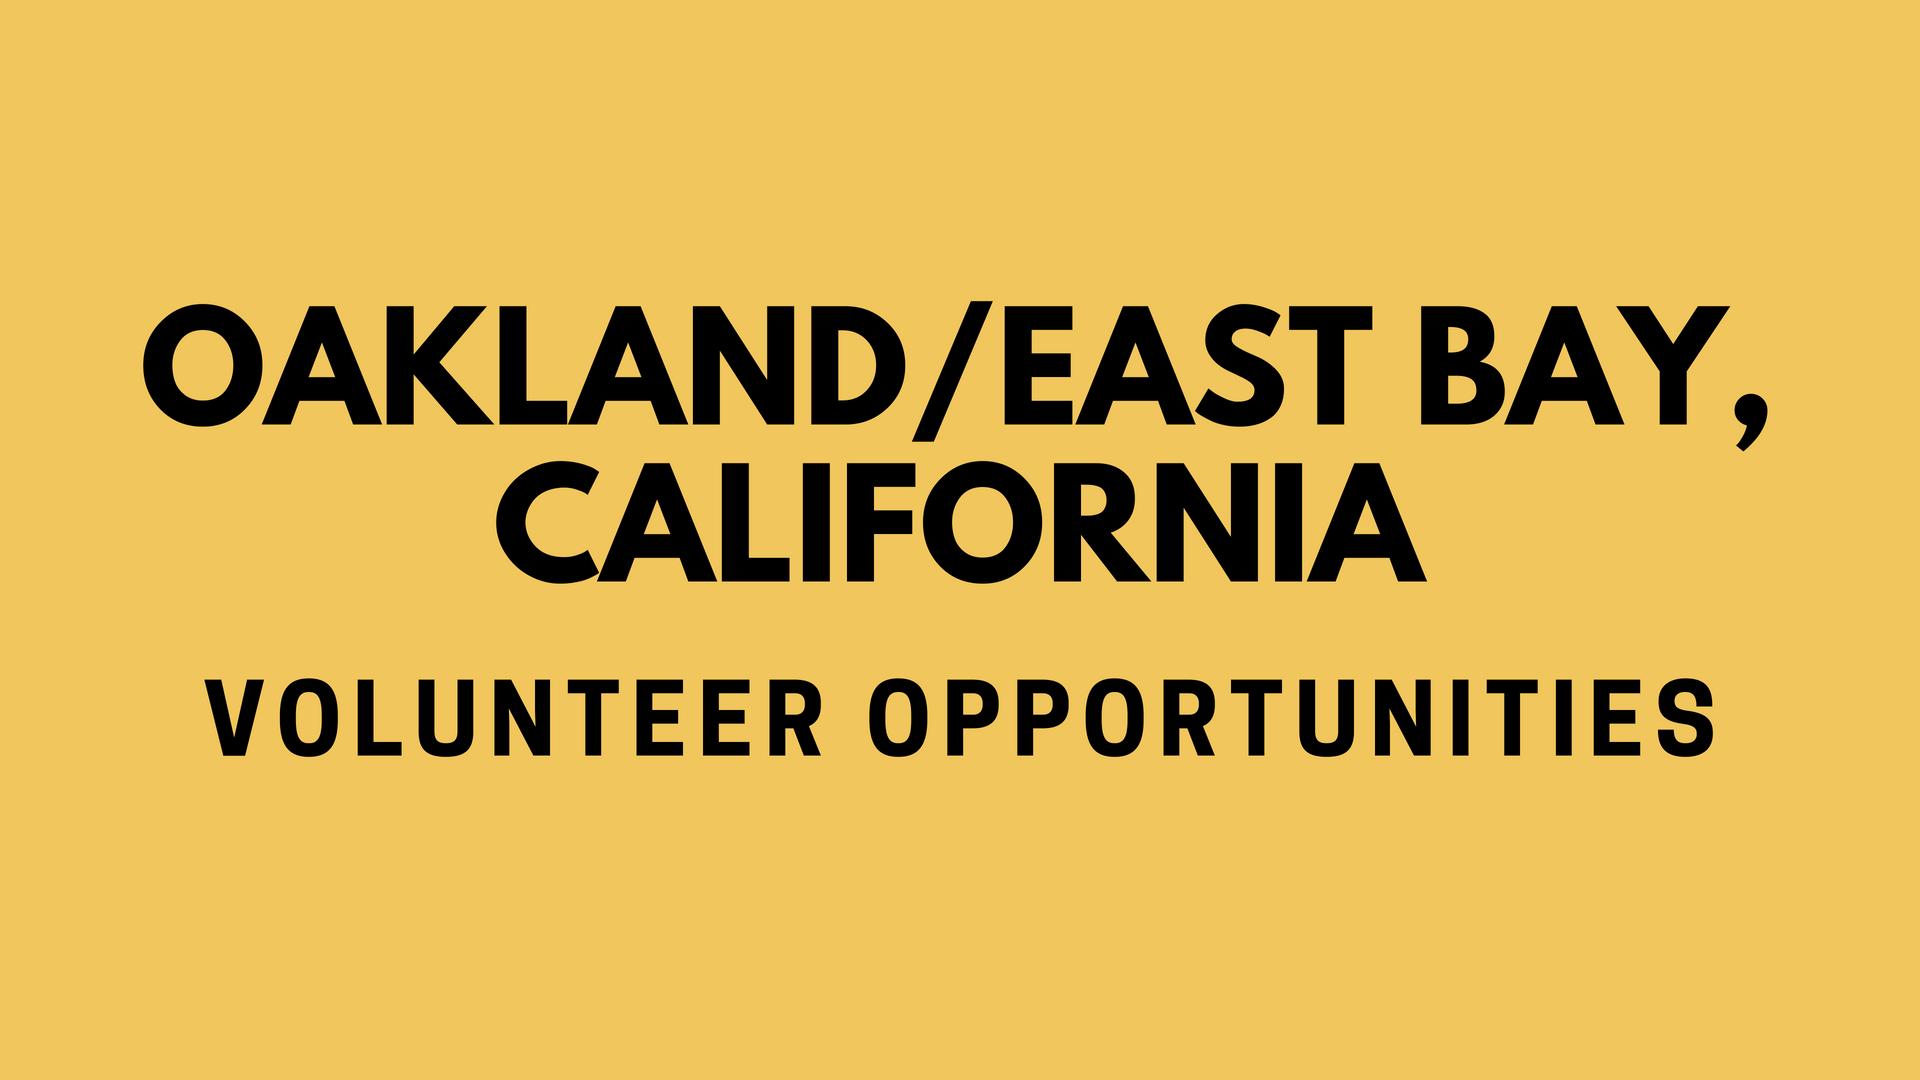 Oakland/East Bay Volunteering